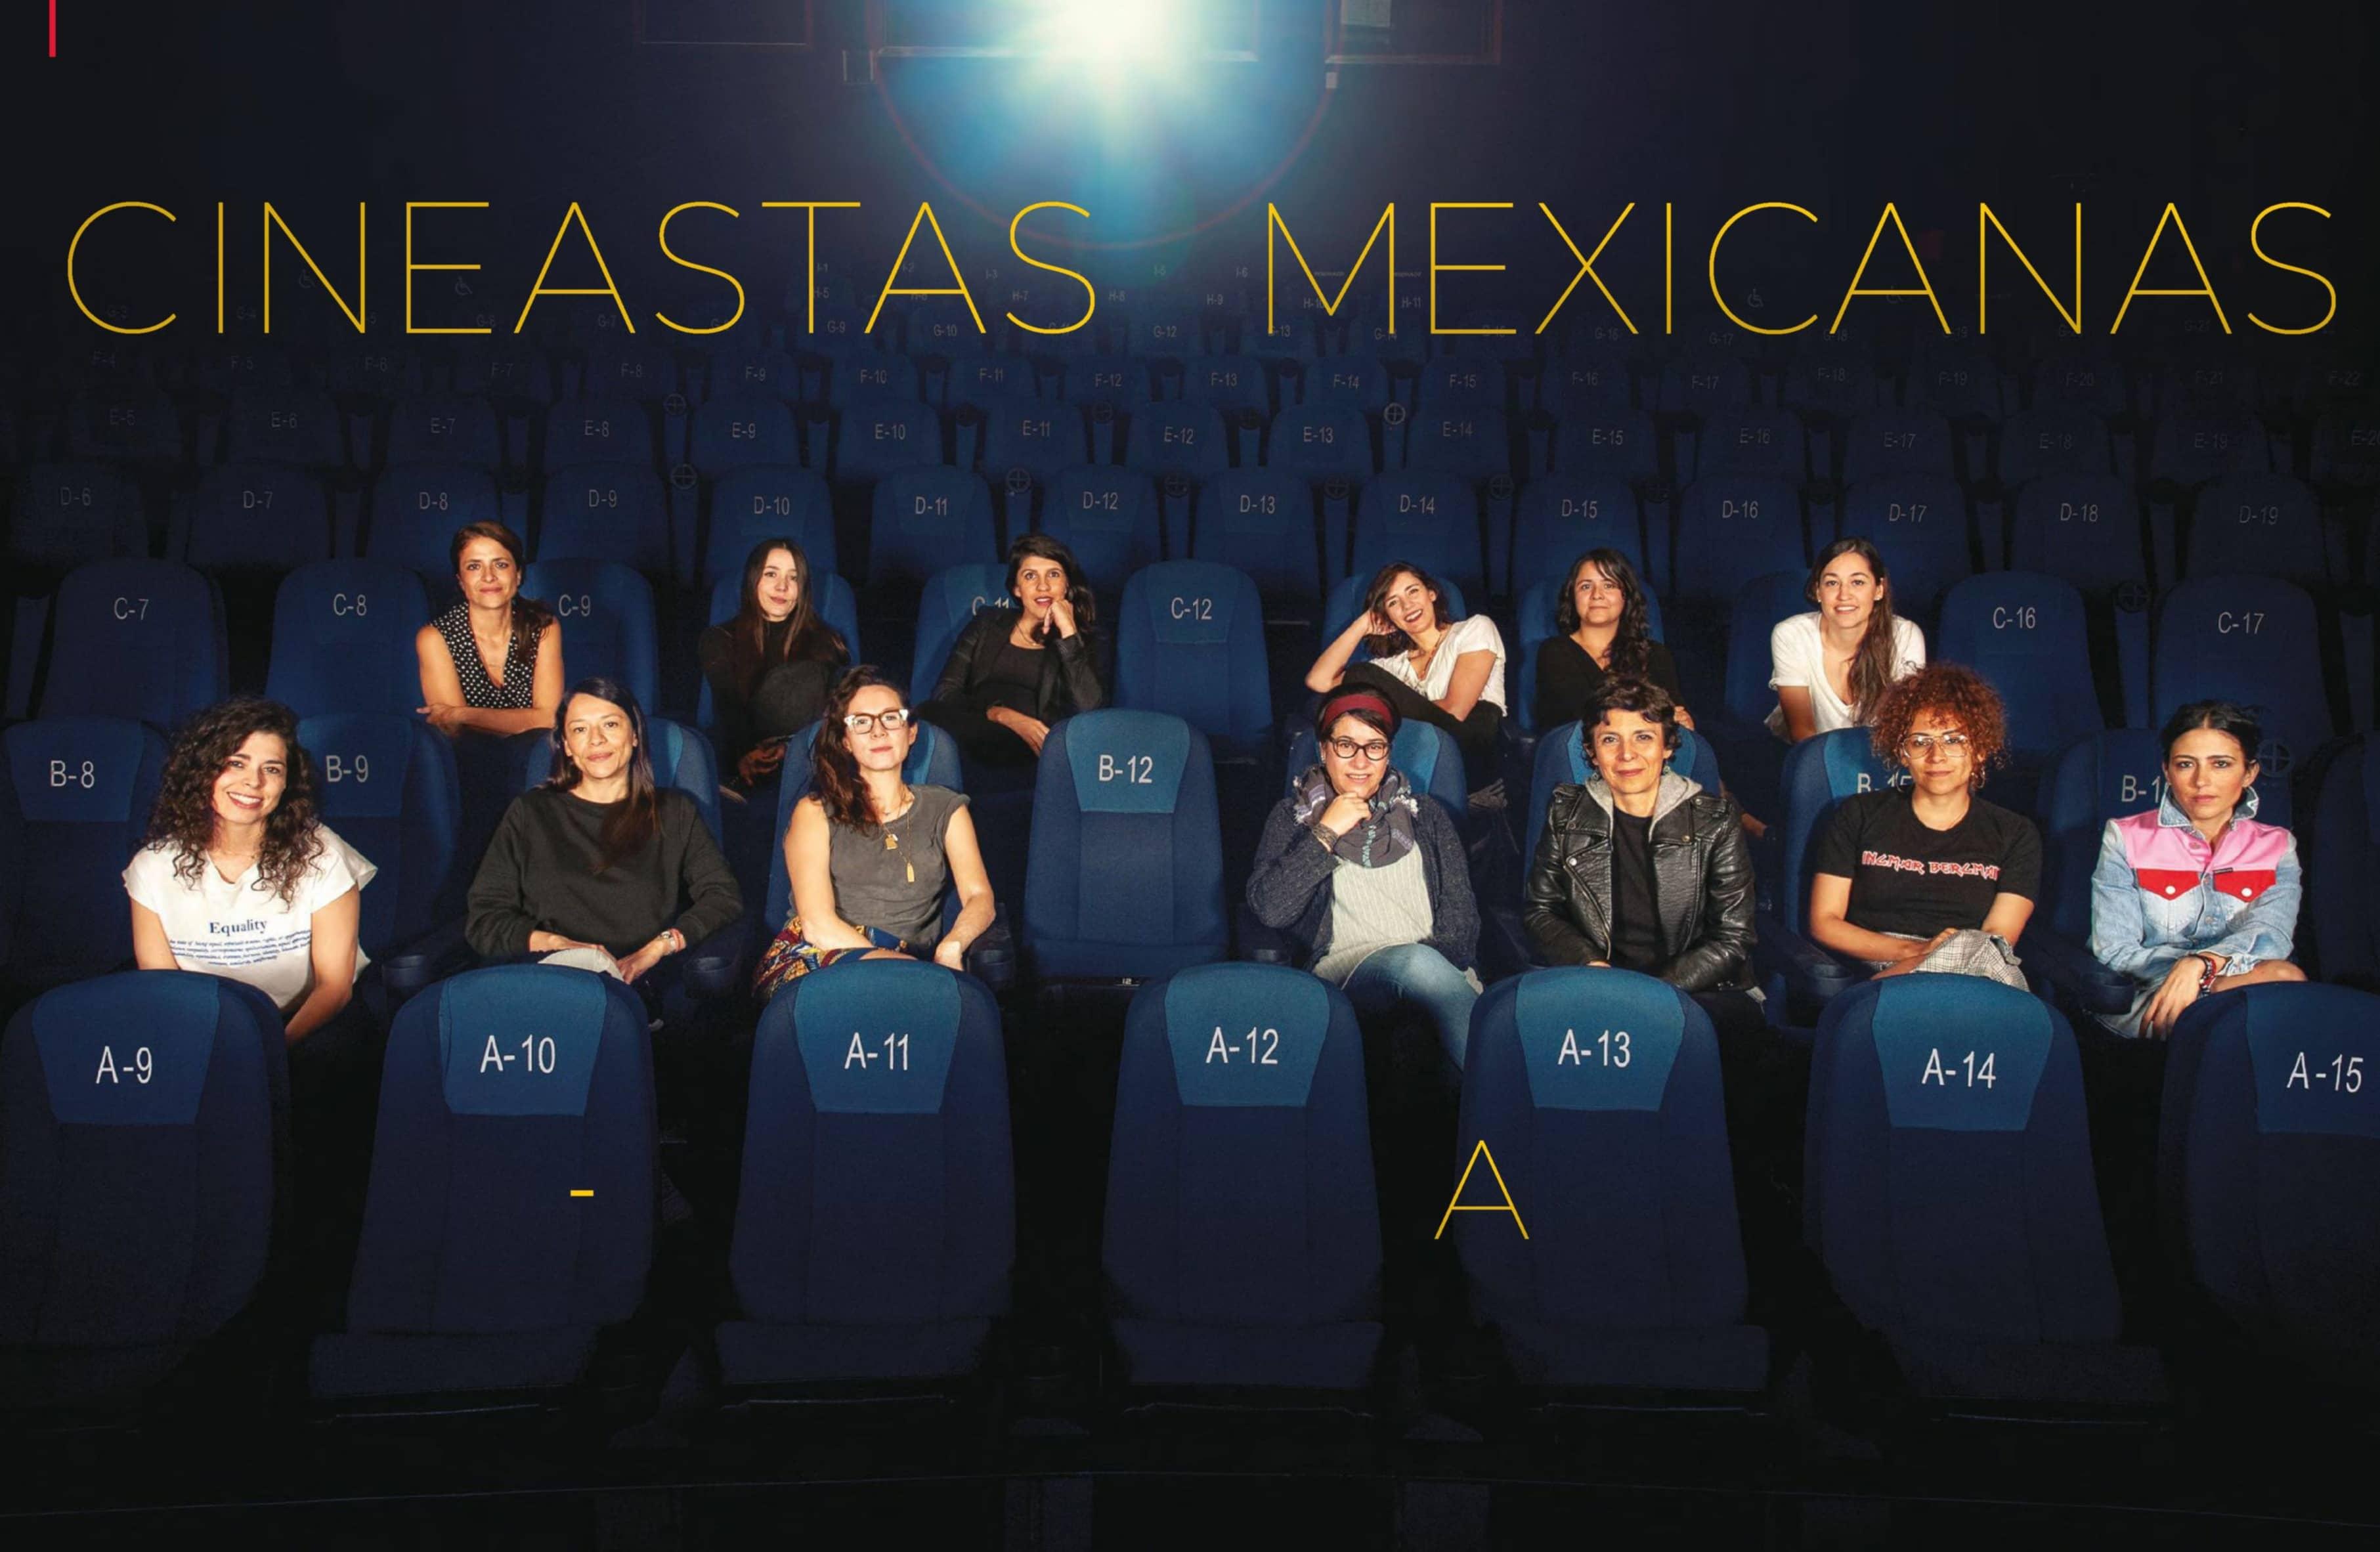 Cineastas mexicanas